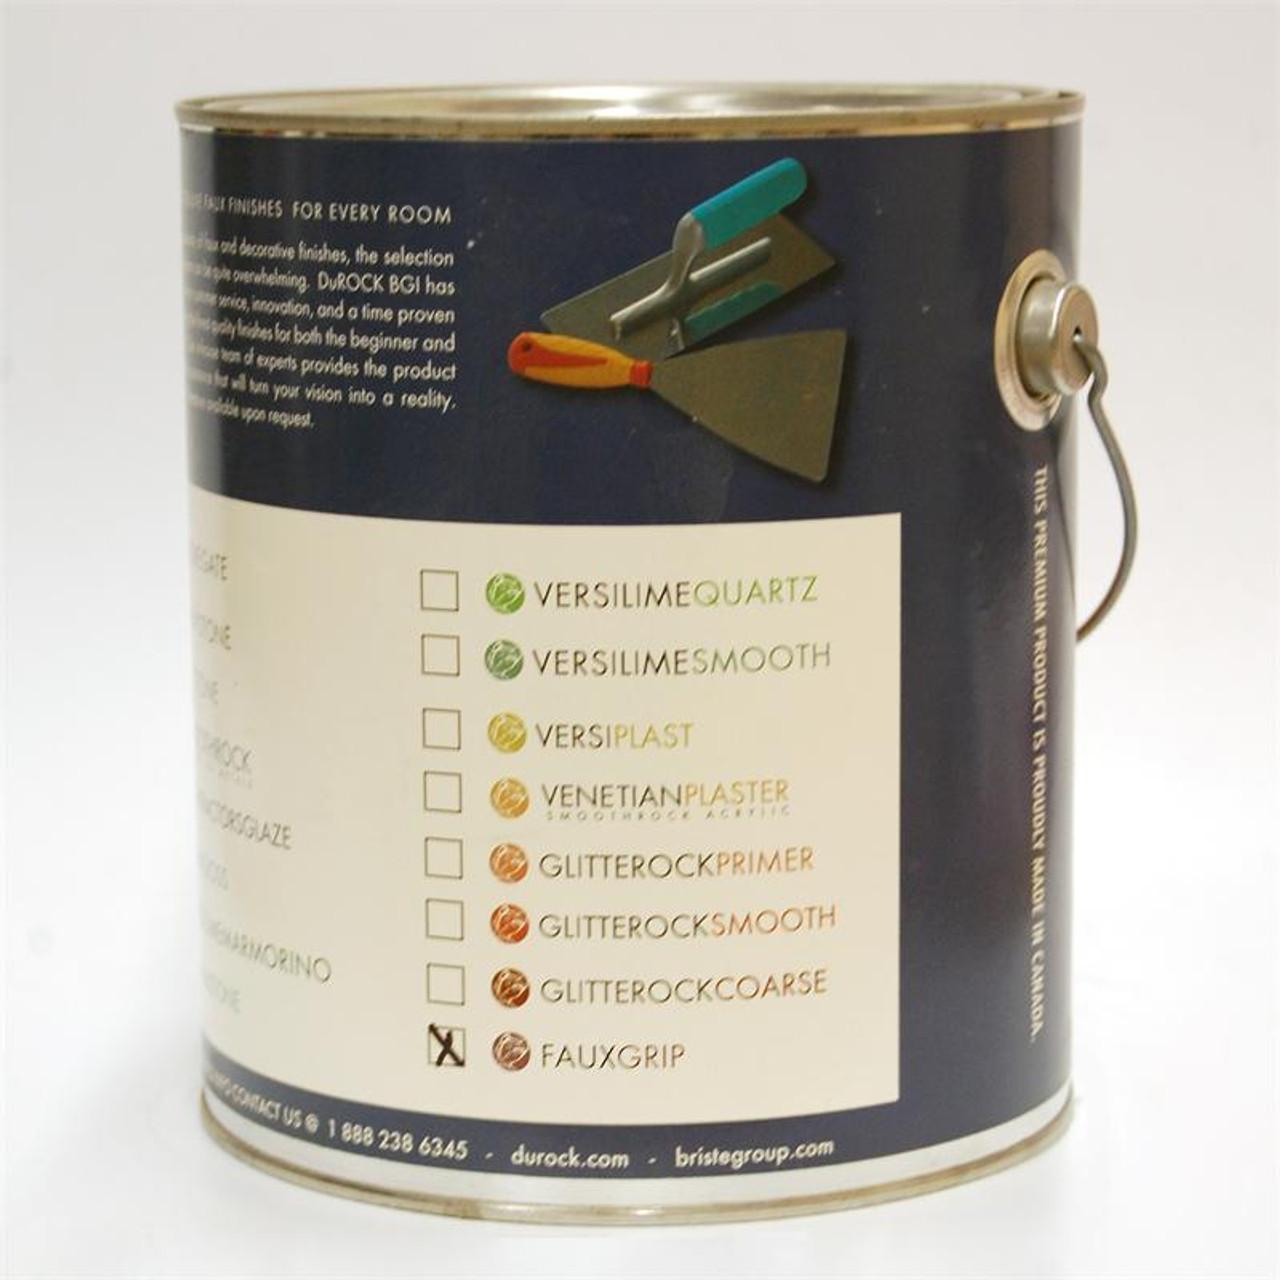 DuRock BGI Faux Grip Primer For Metal & Difficult Surfaces